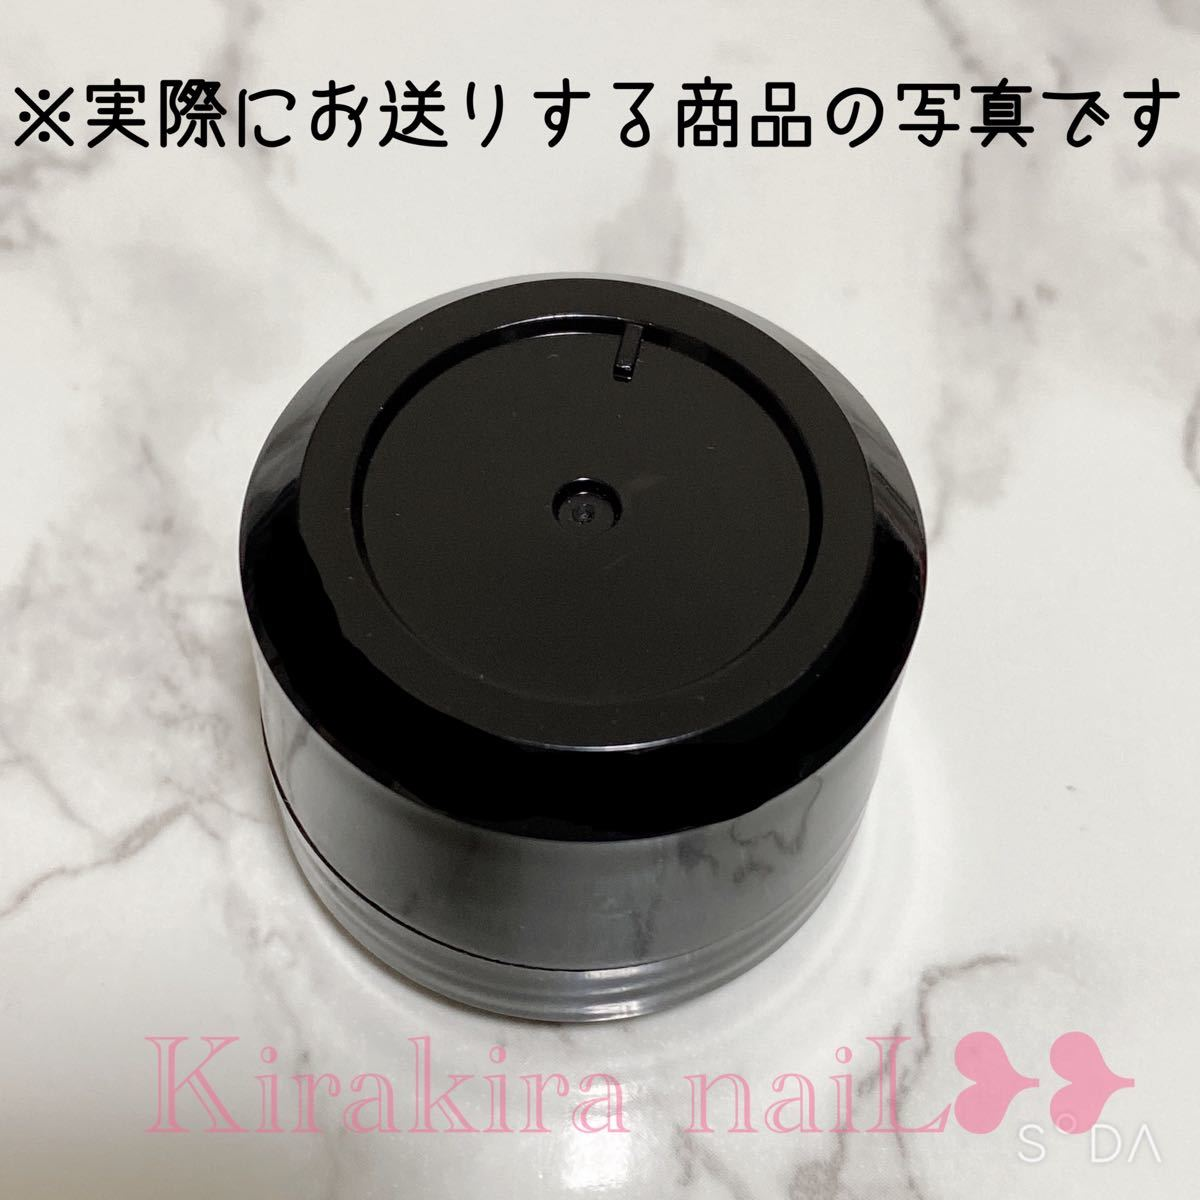 New★全12種☆Venalisa☆グリッタージェル☆カラーラメジェル P55